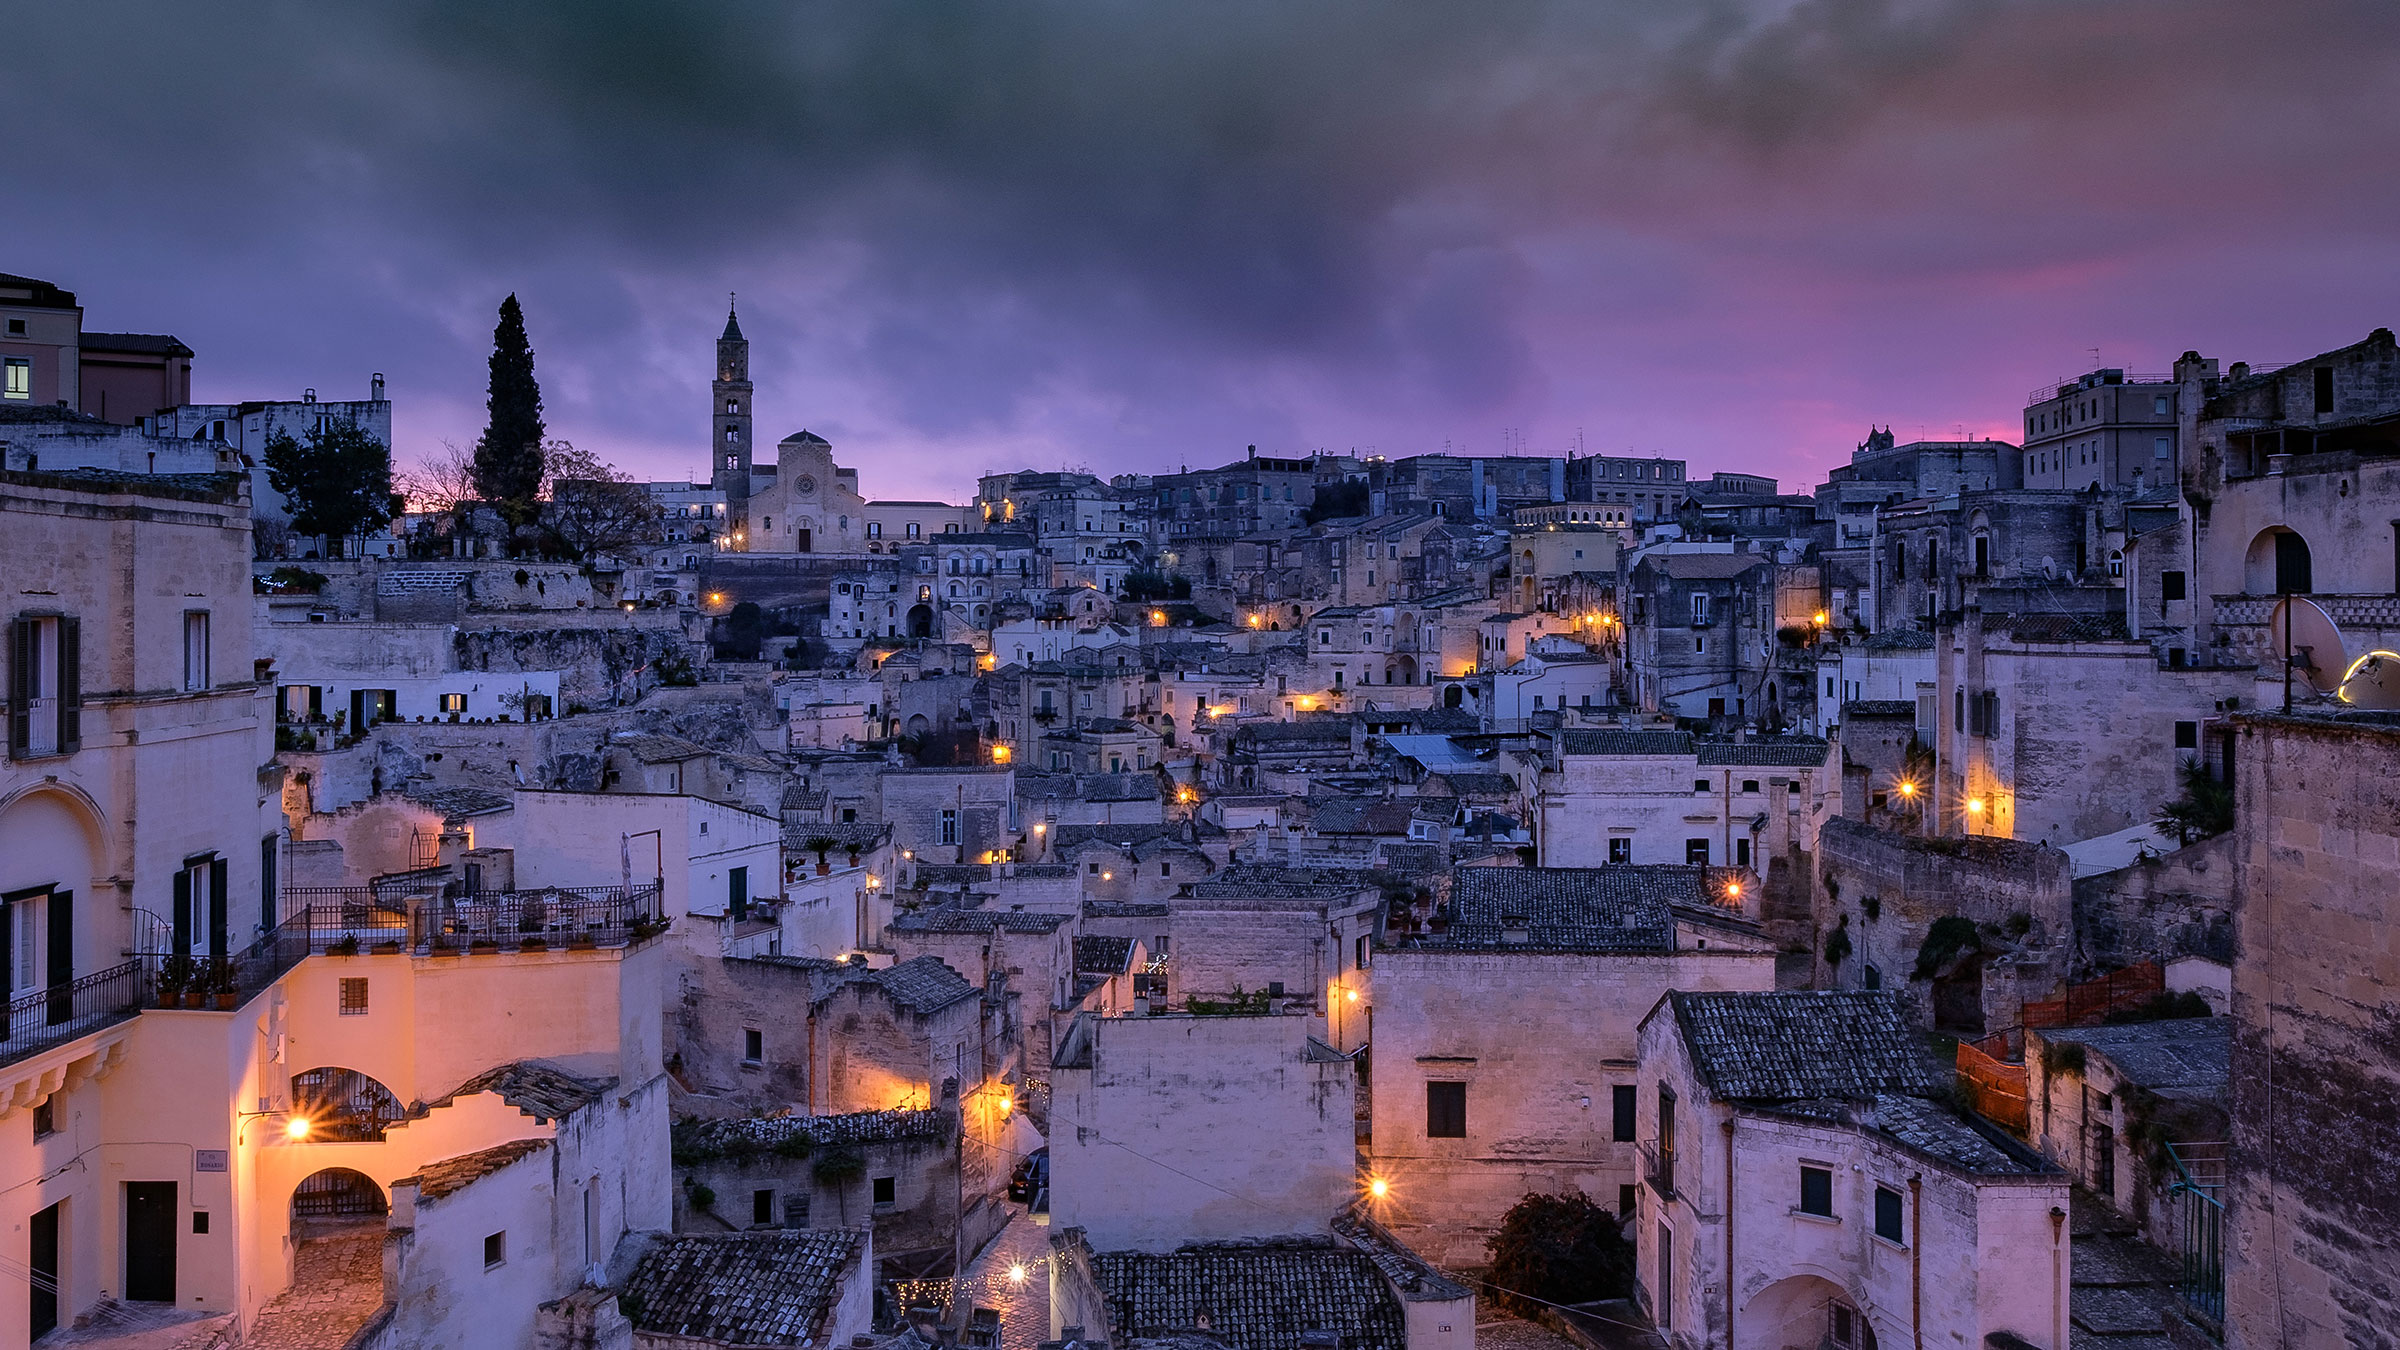 Matera - drizzly dawn...